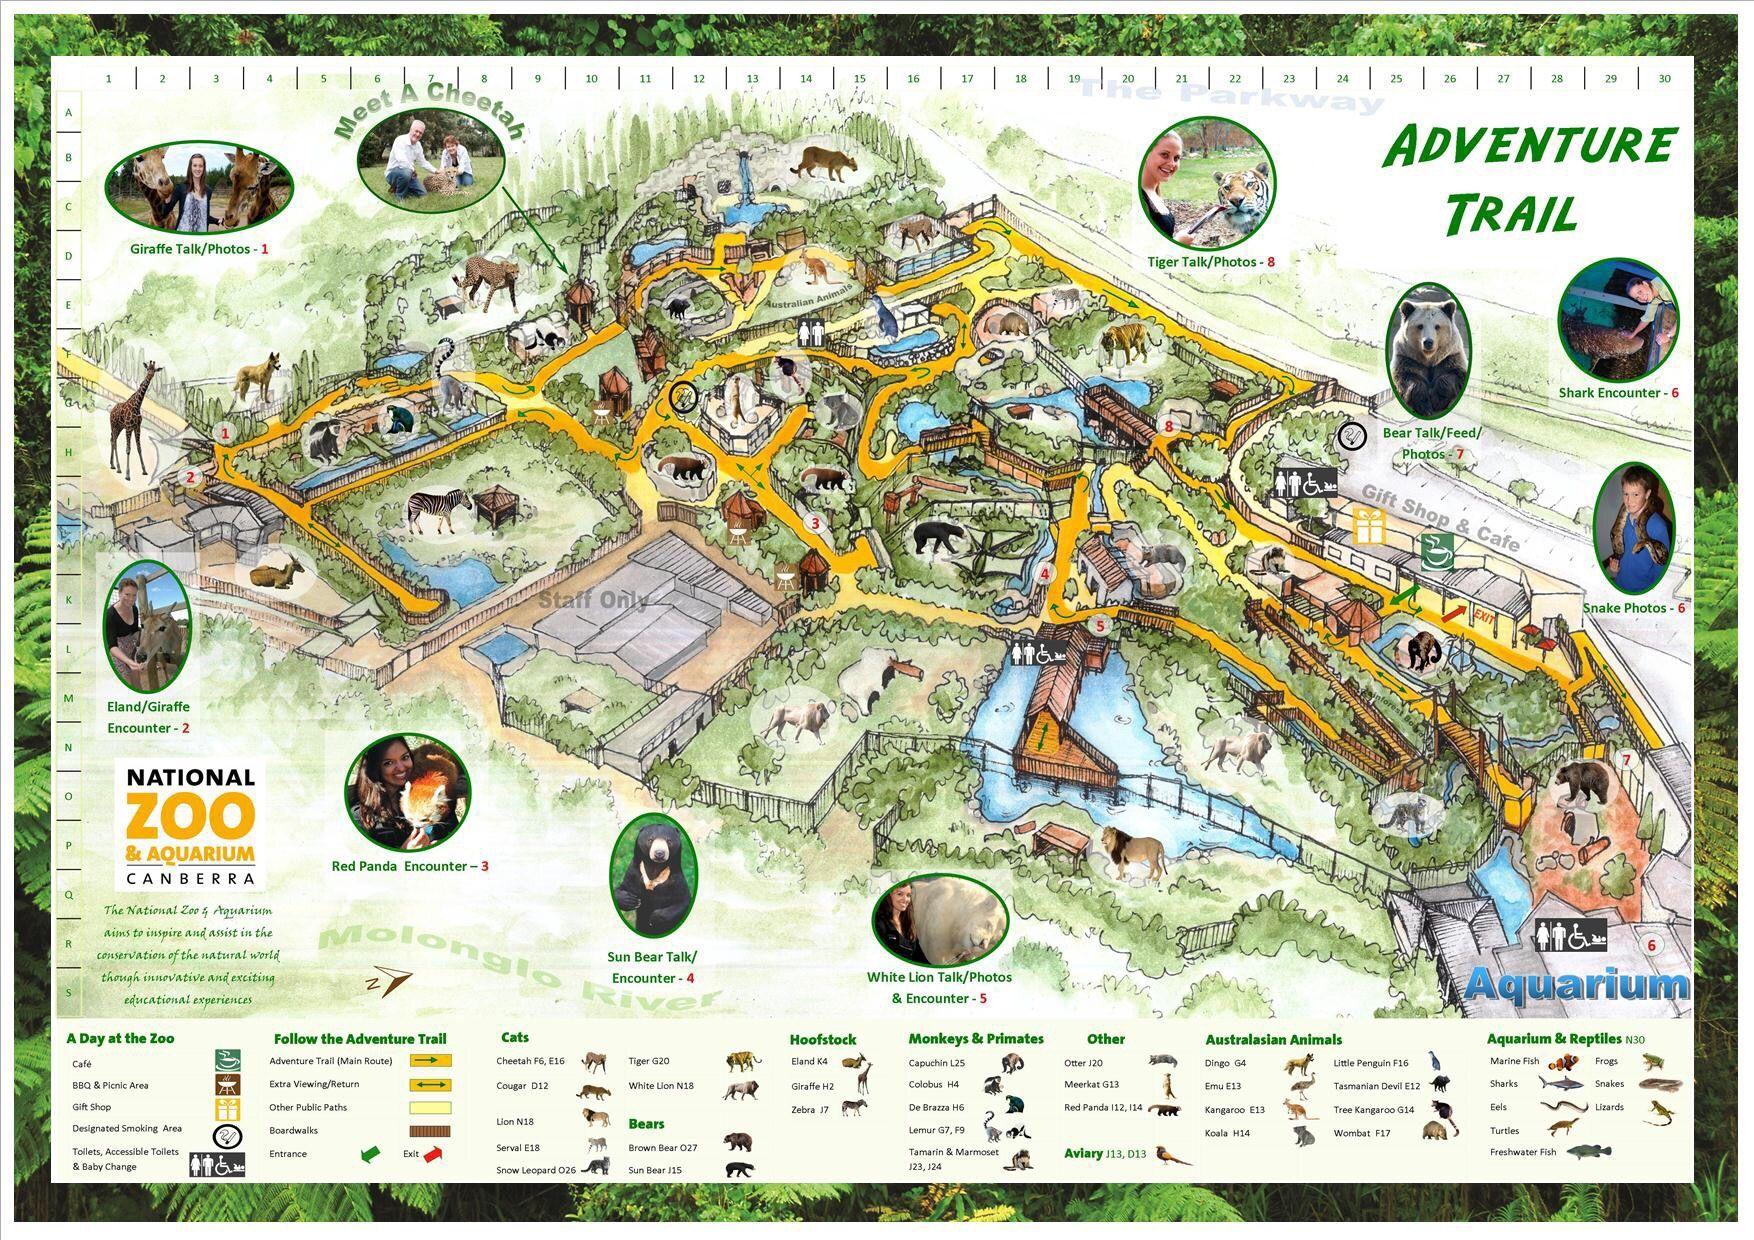 Old Australia Zoo Map.Taronga Zoo Native Animals Sydney Australia With Images Zoo